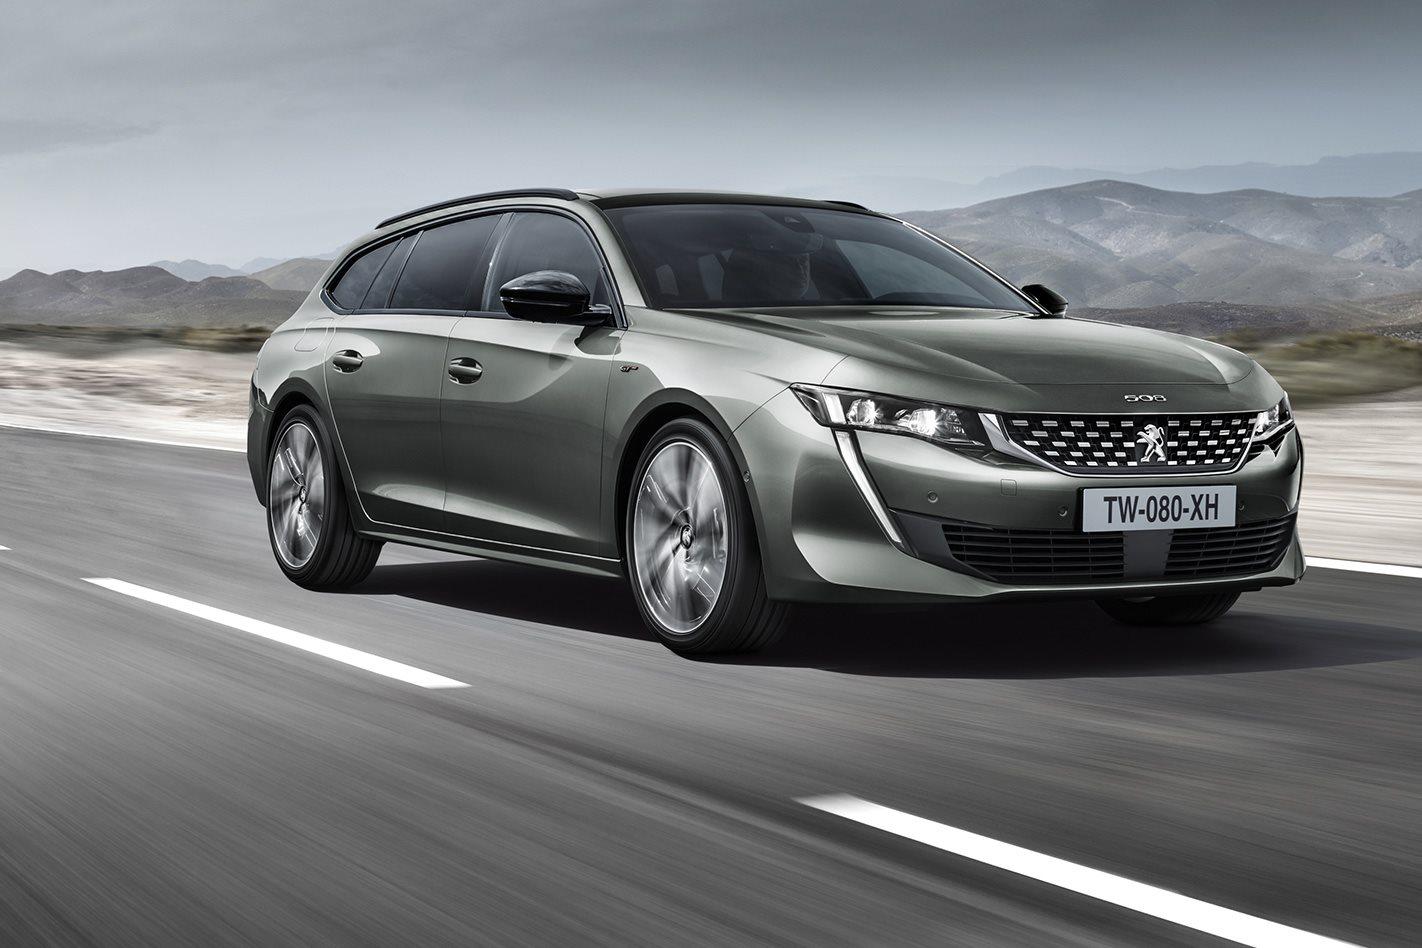 2019 Peugeot 508 review